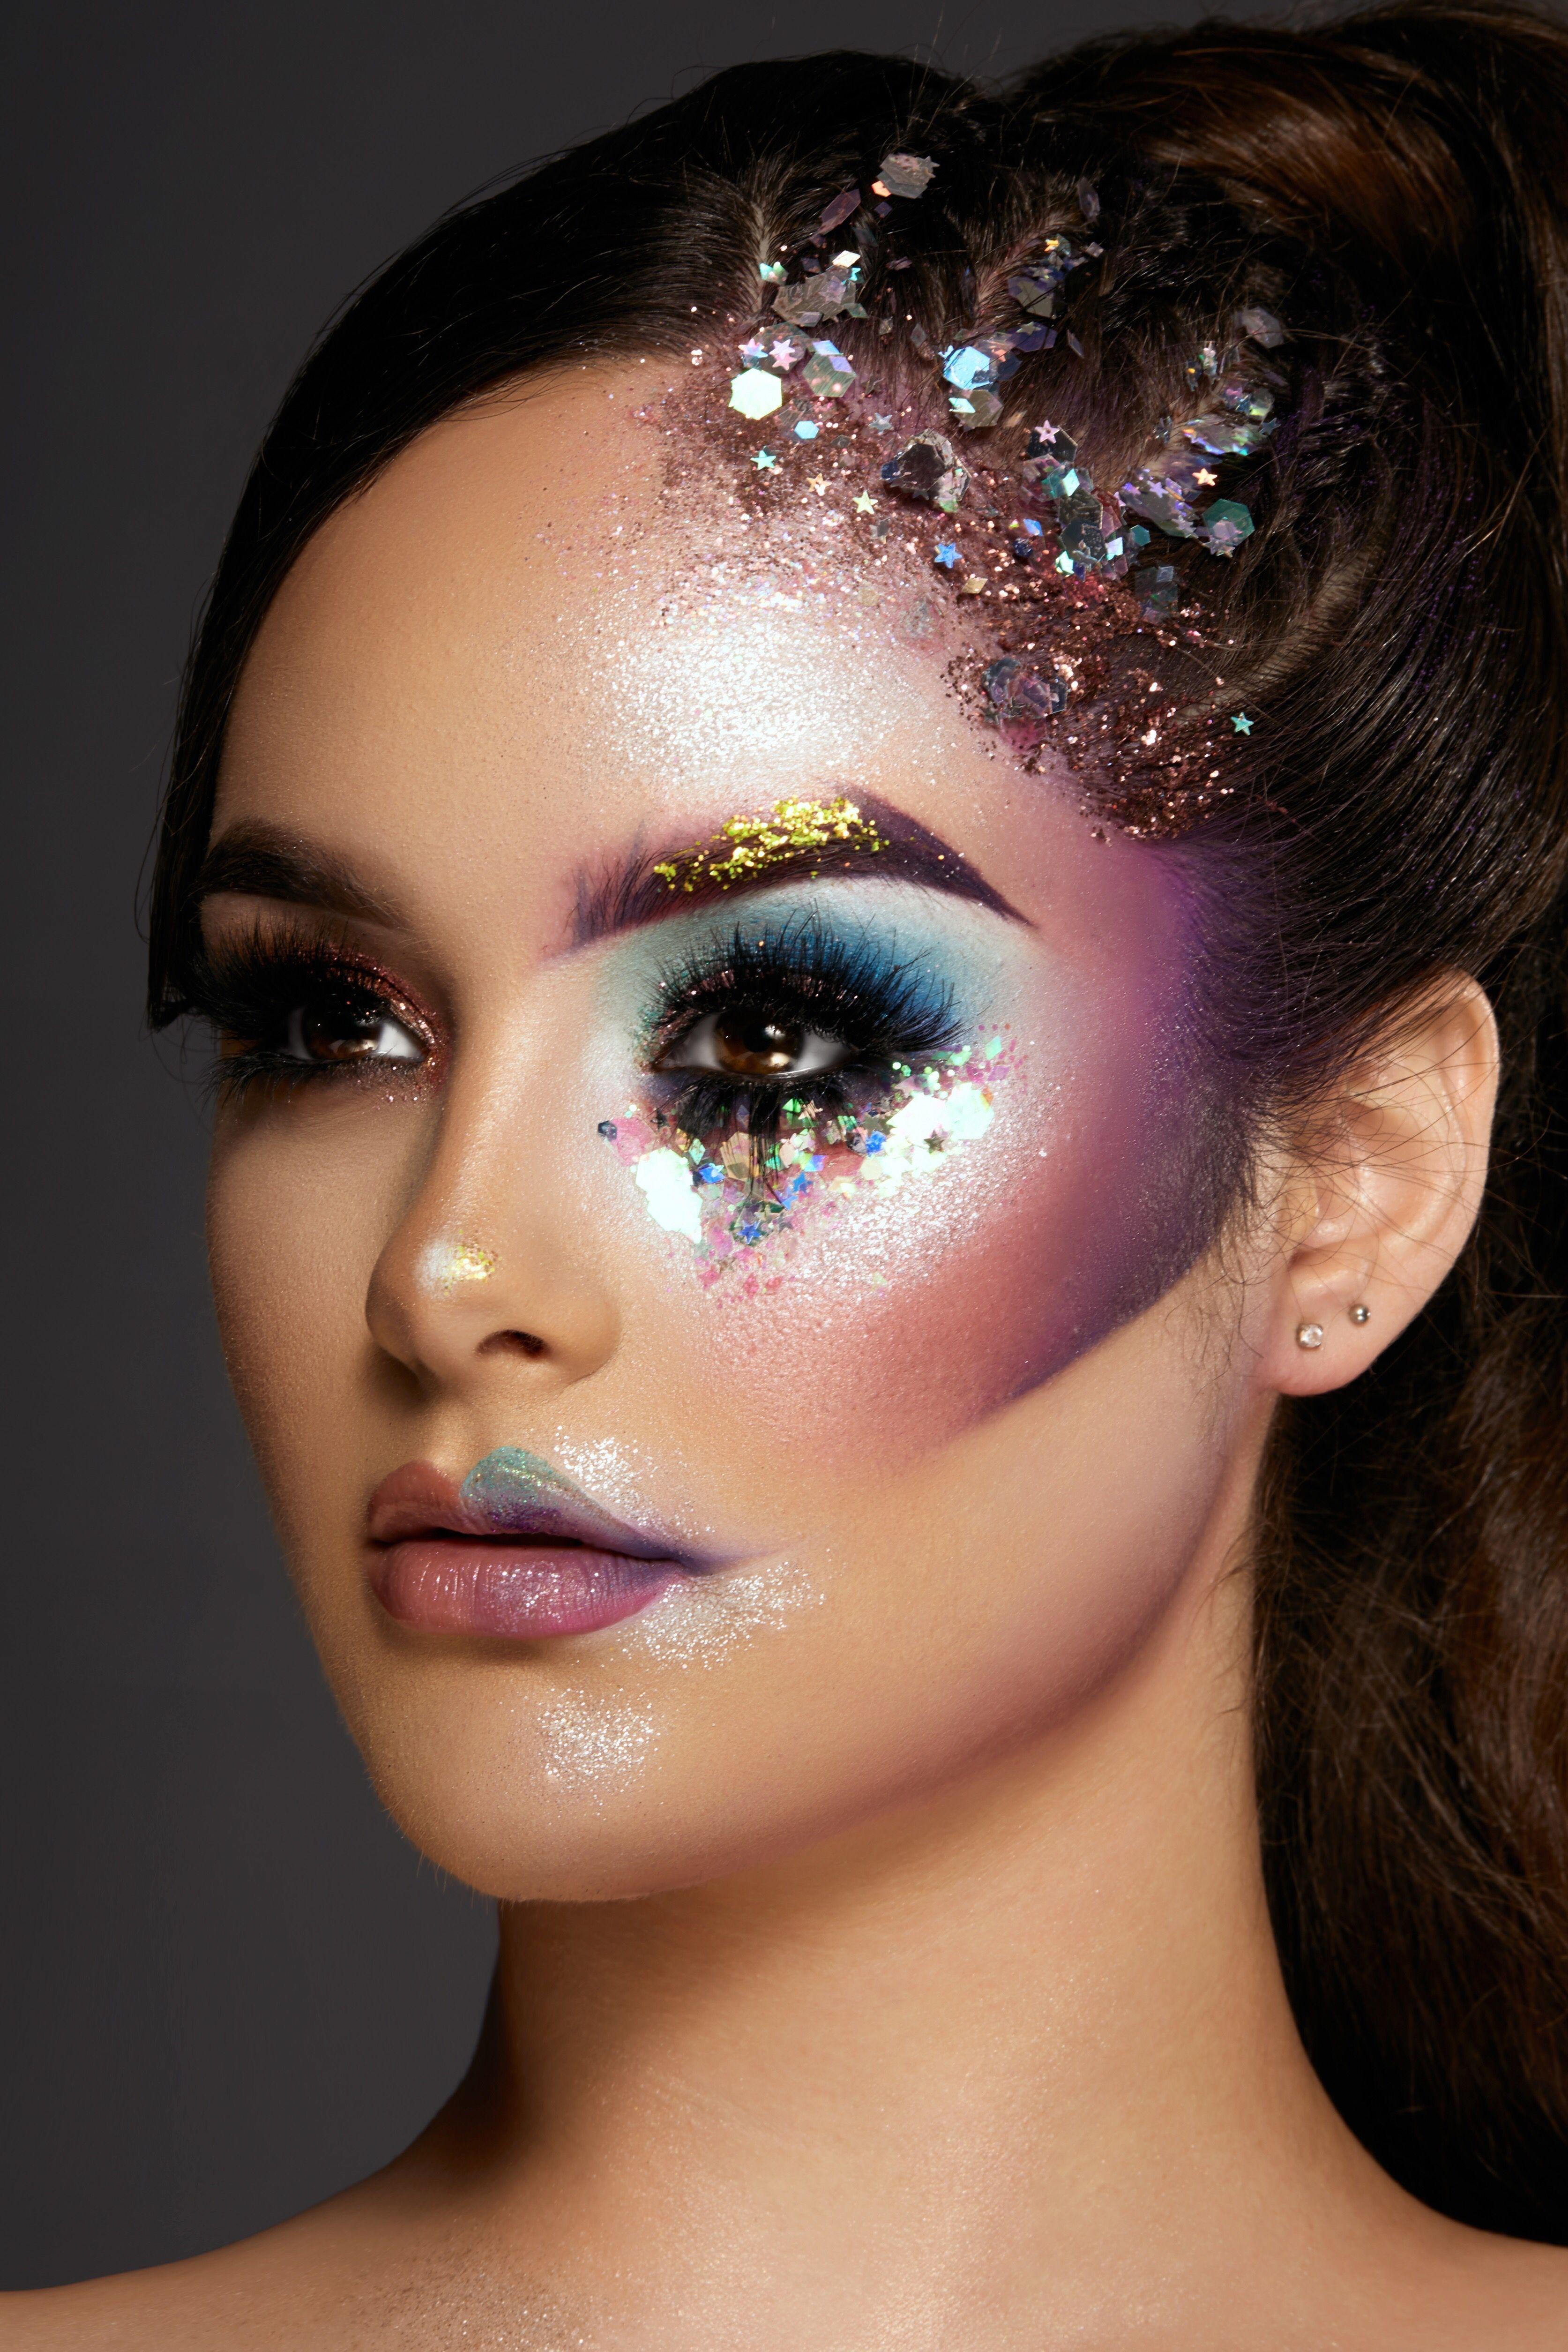 Korektor Make Up In 2020 Fashion Show Makeup Glitter Makeup Looks Futuristic Makeup